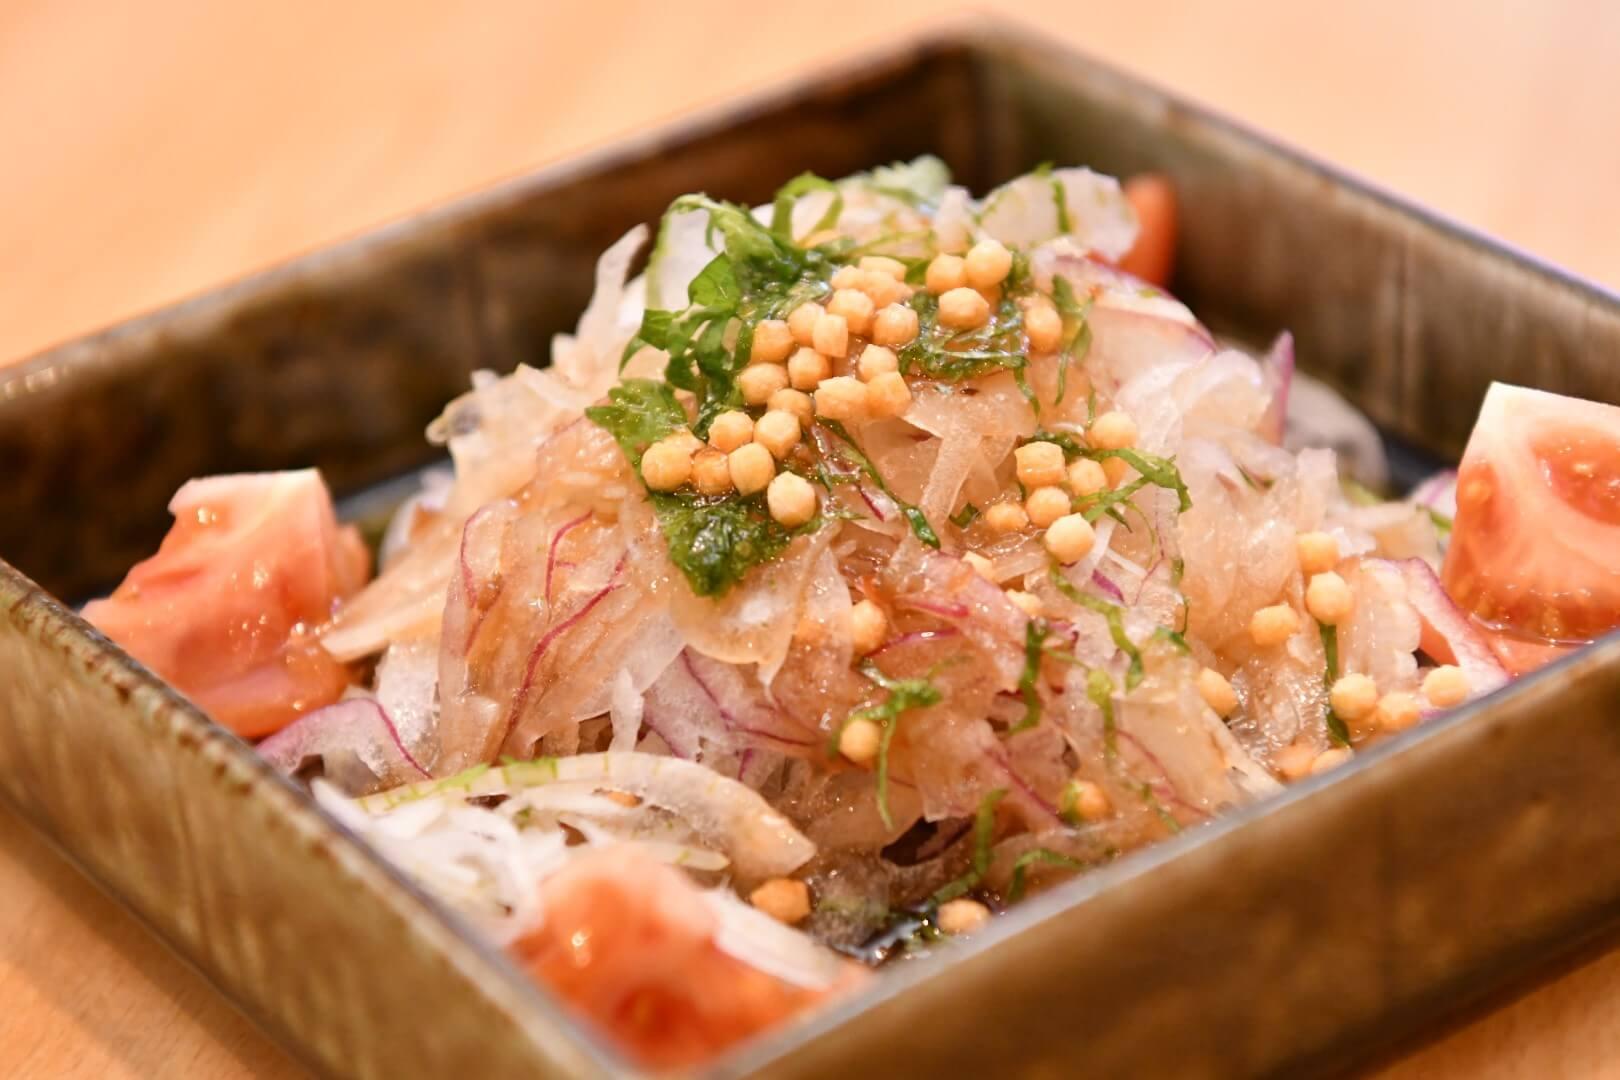 新玉葱サラダ - 札幌 居酒屋道